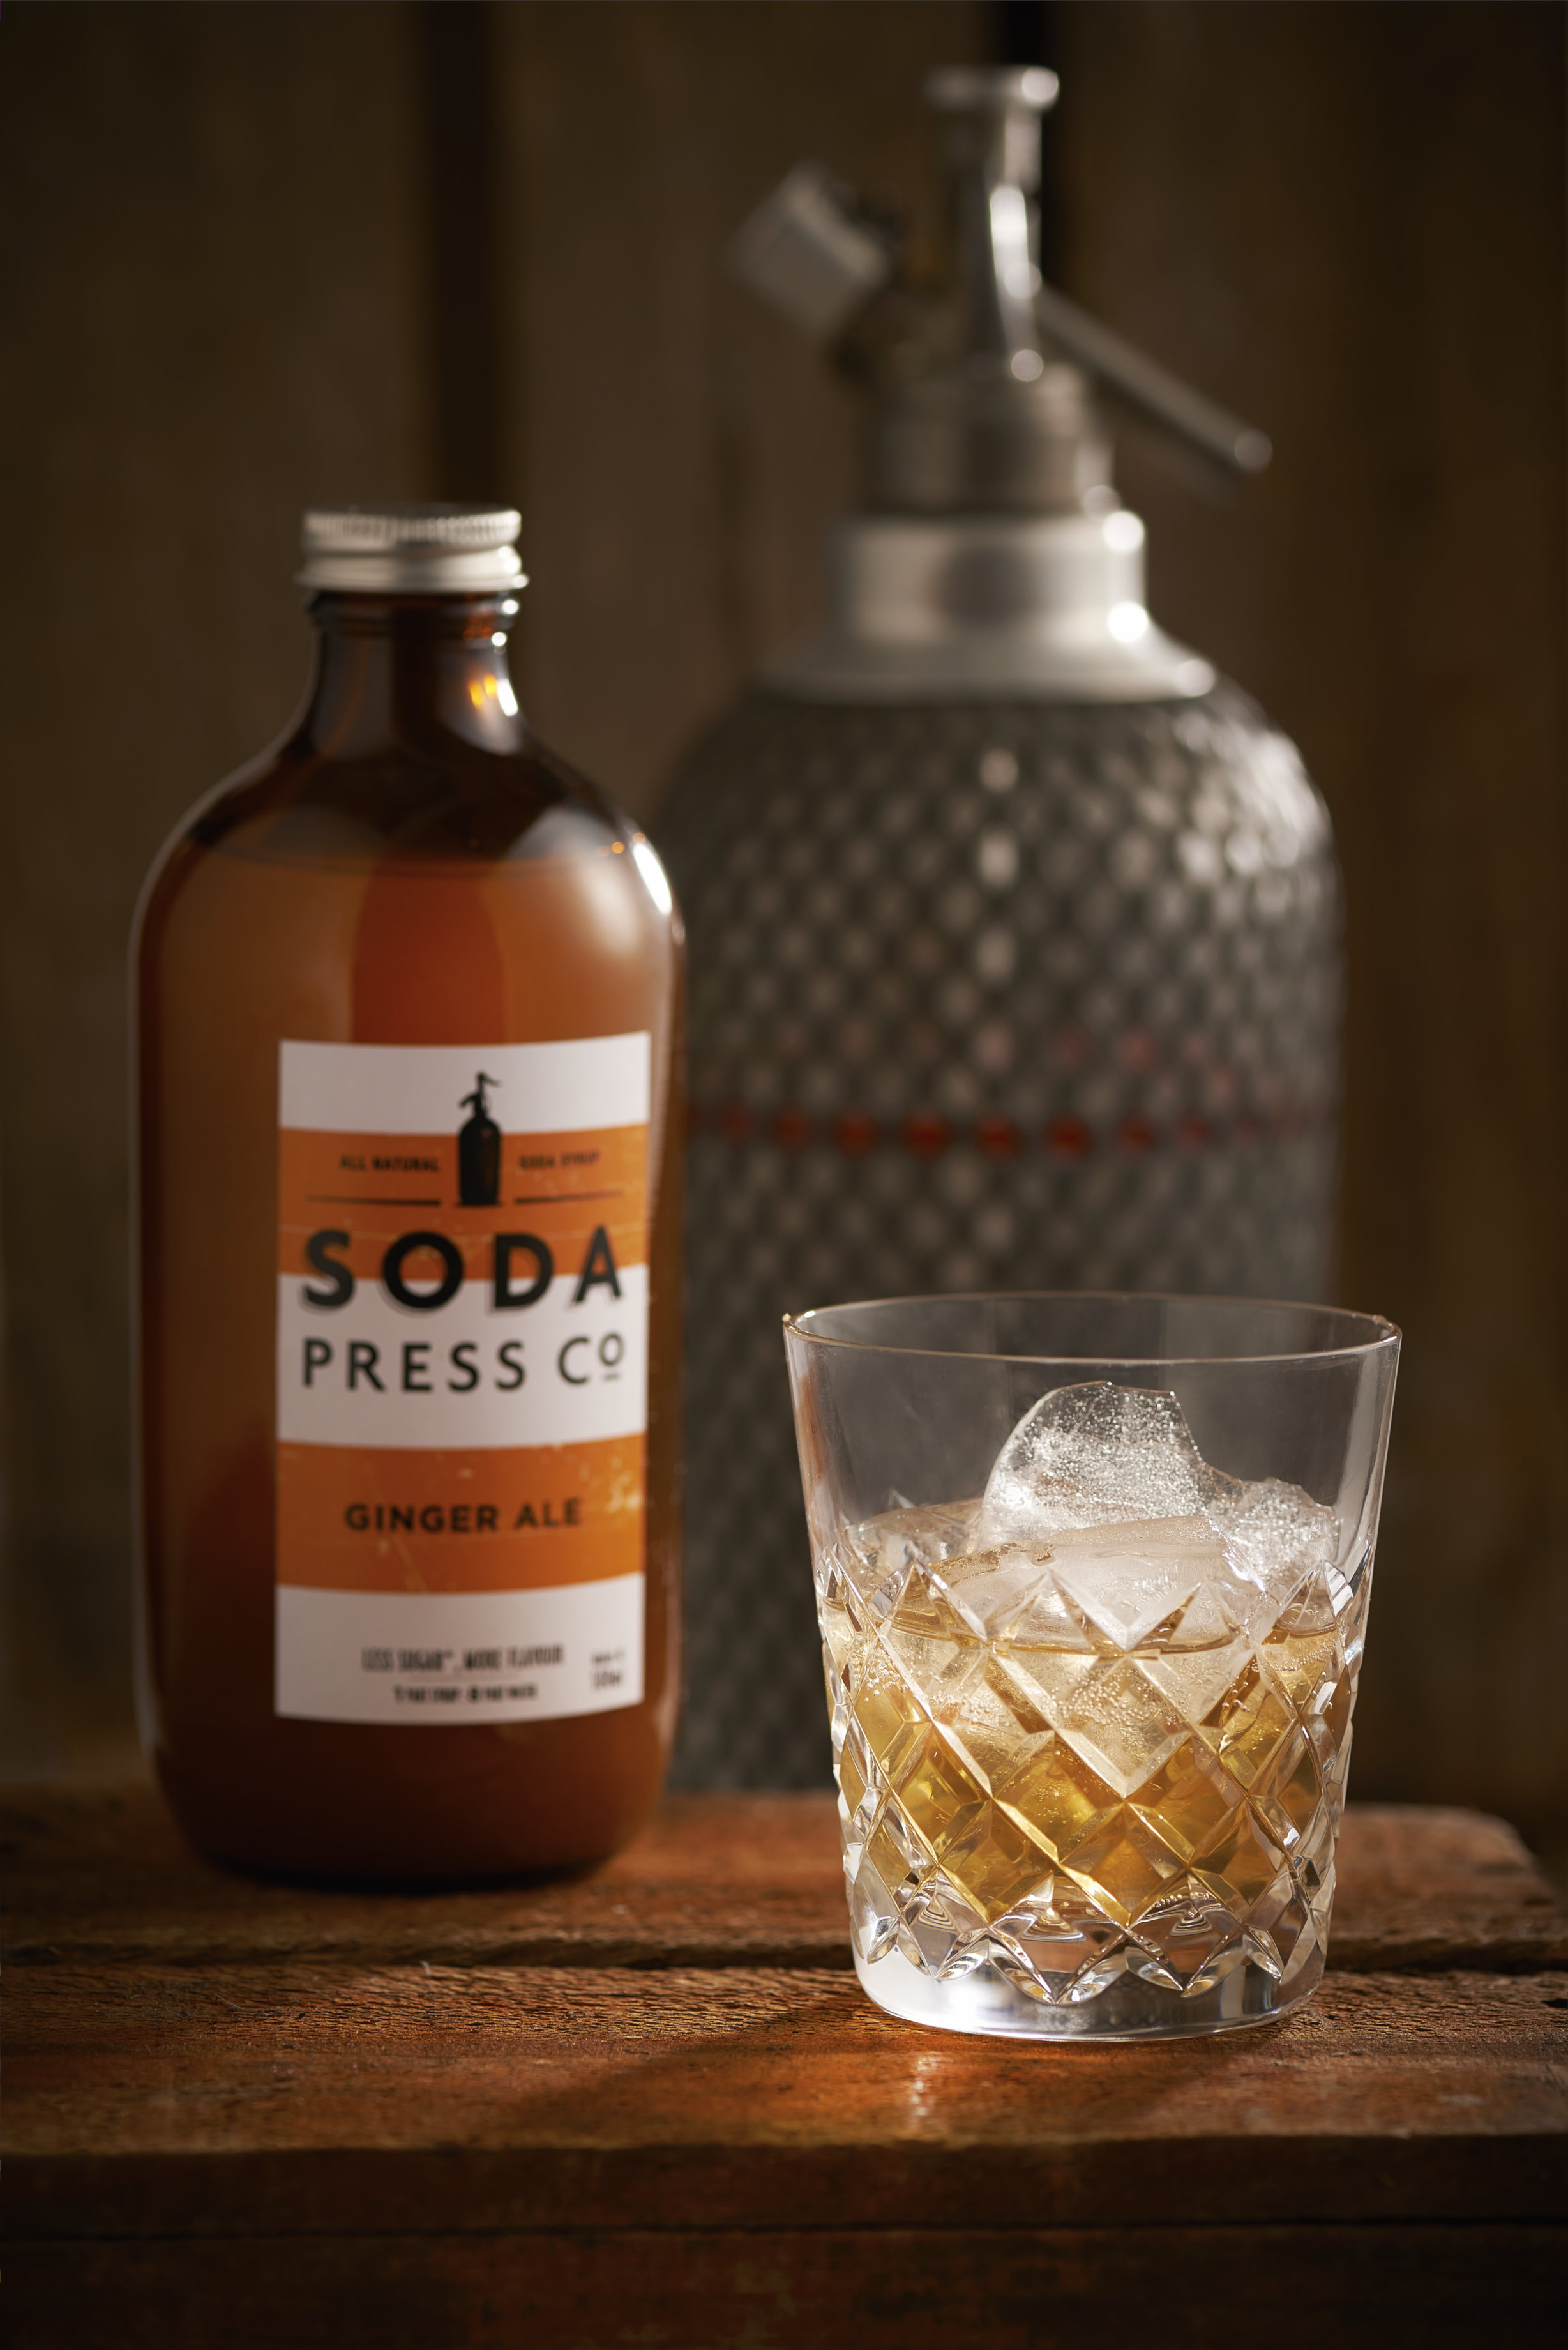 Soda Press Co. Organic fruit syrups